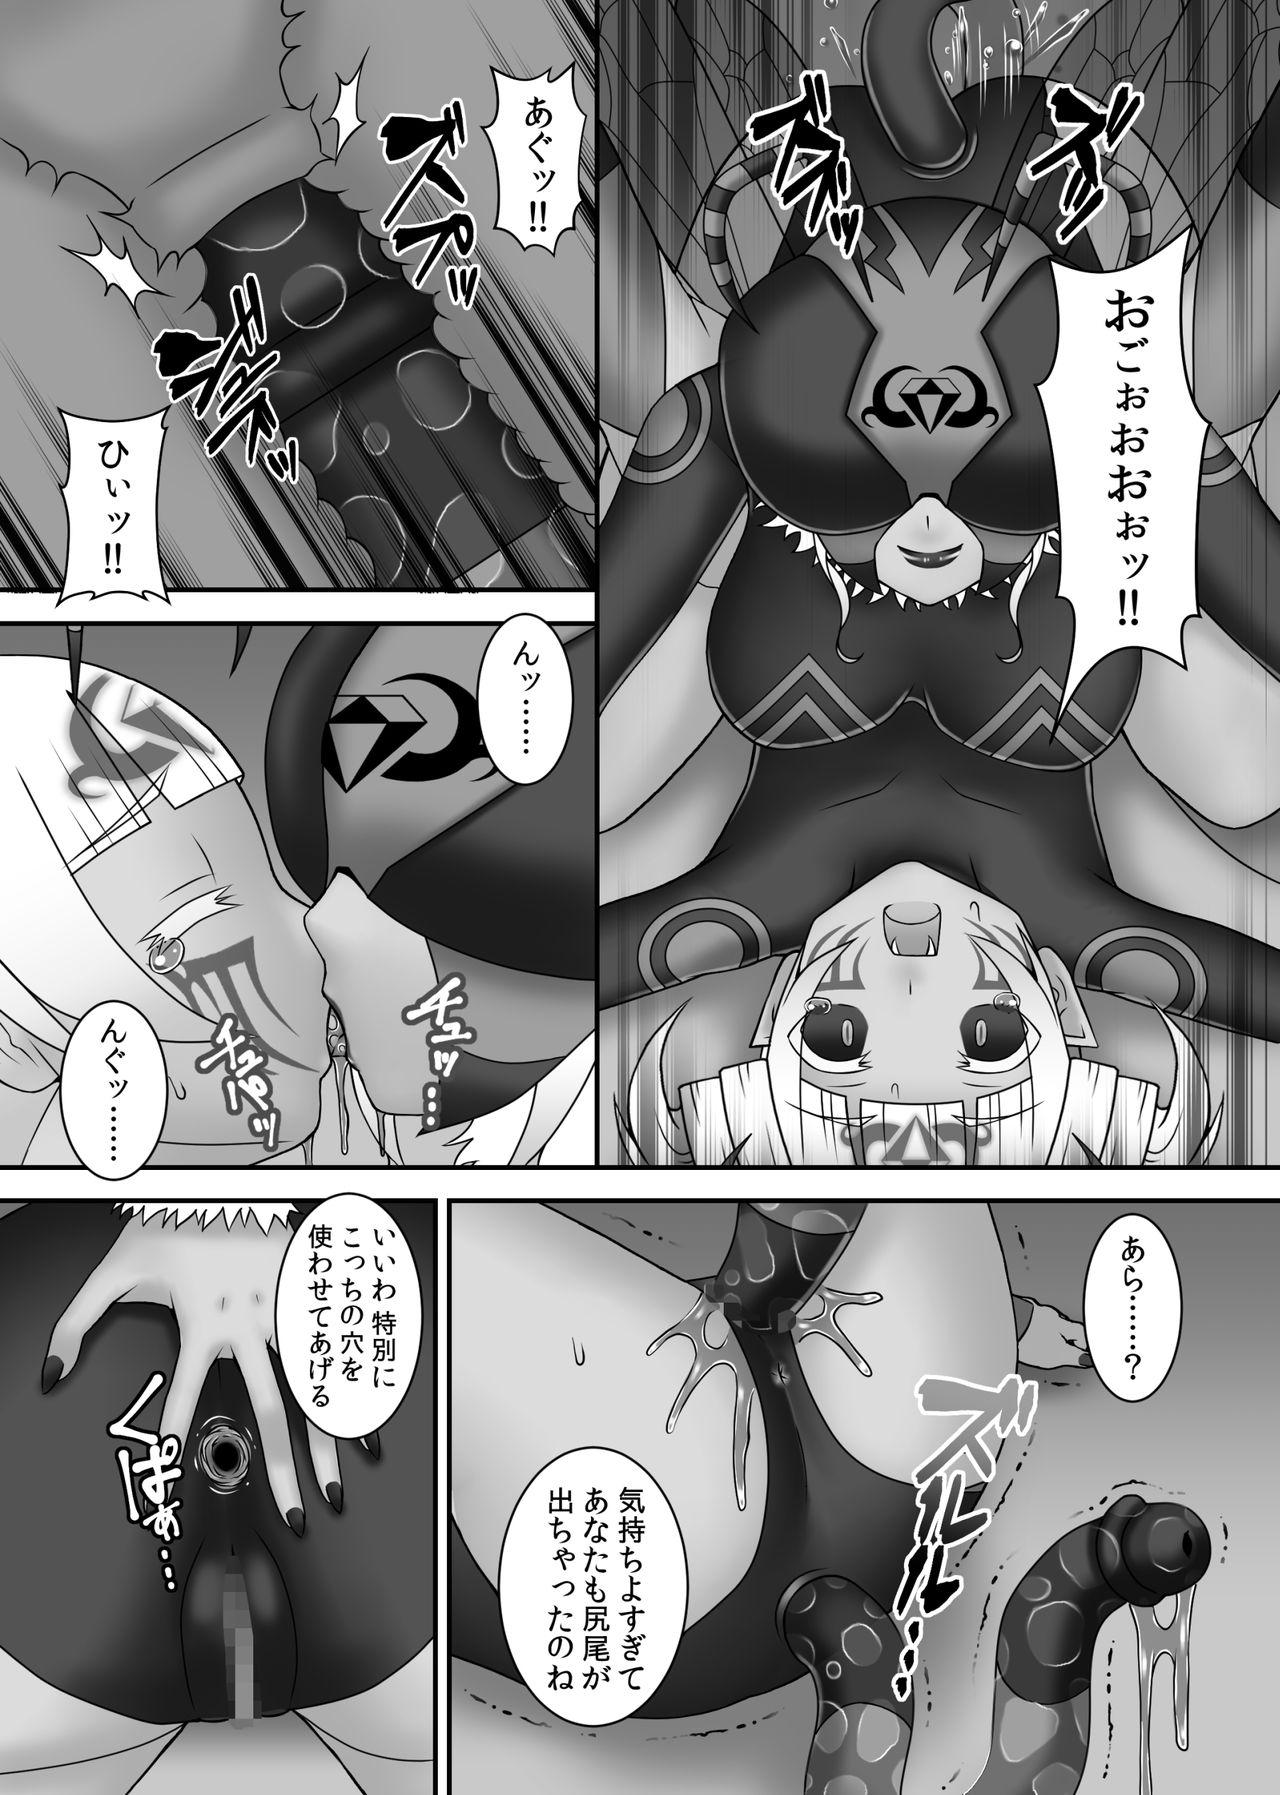 [STUDIO HP+ (IceLee)] Teisou Sentai Virginal Colors Dai-Go-wa 39